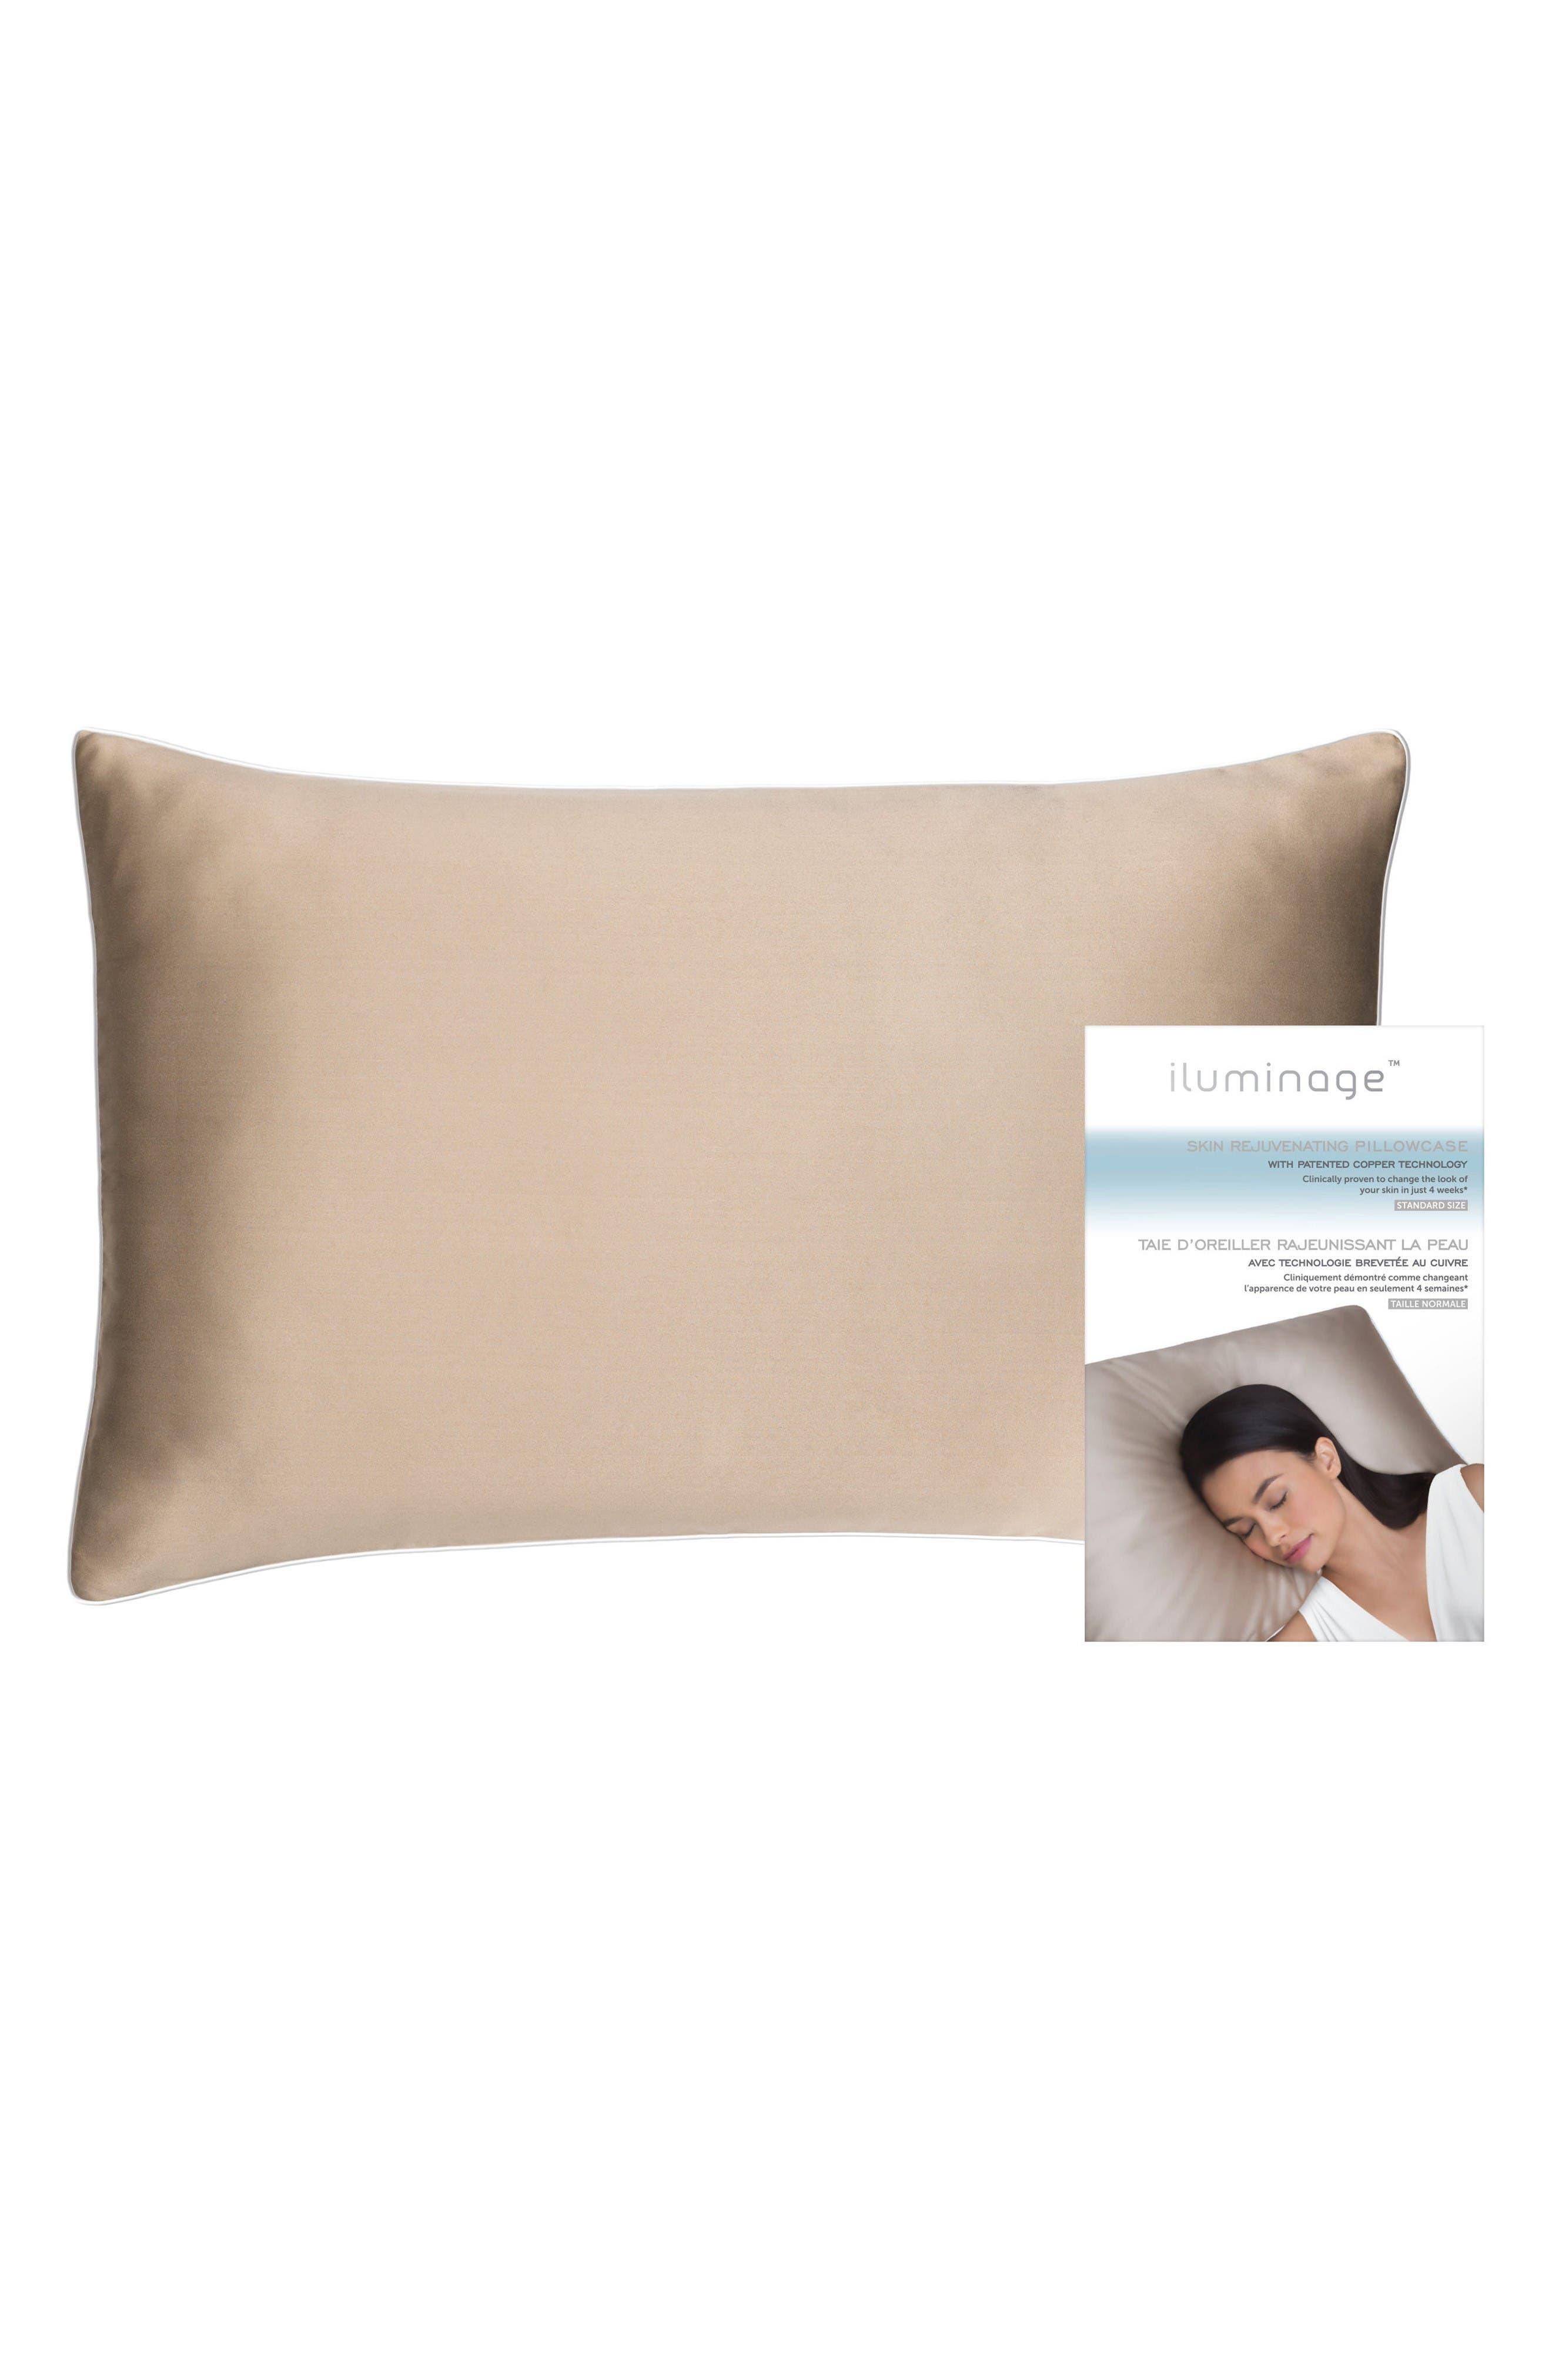 Skin Rejuvenating Pillowcase,                         Main,                         color, No Color